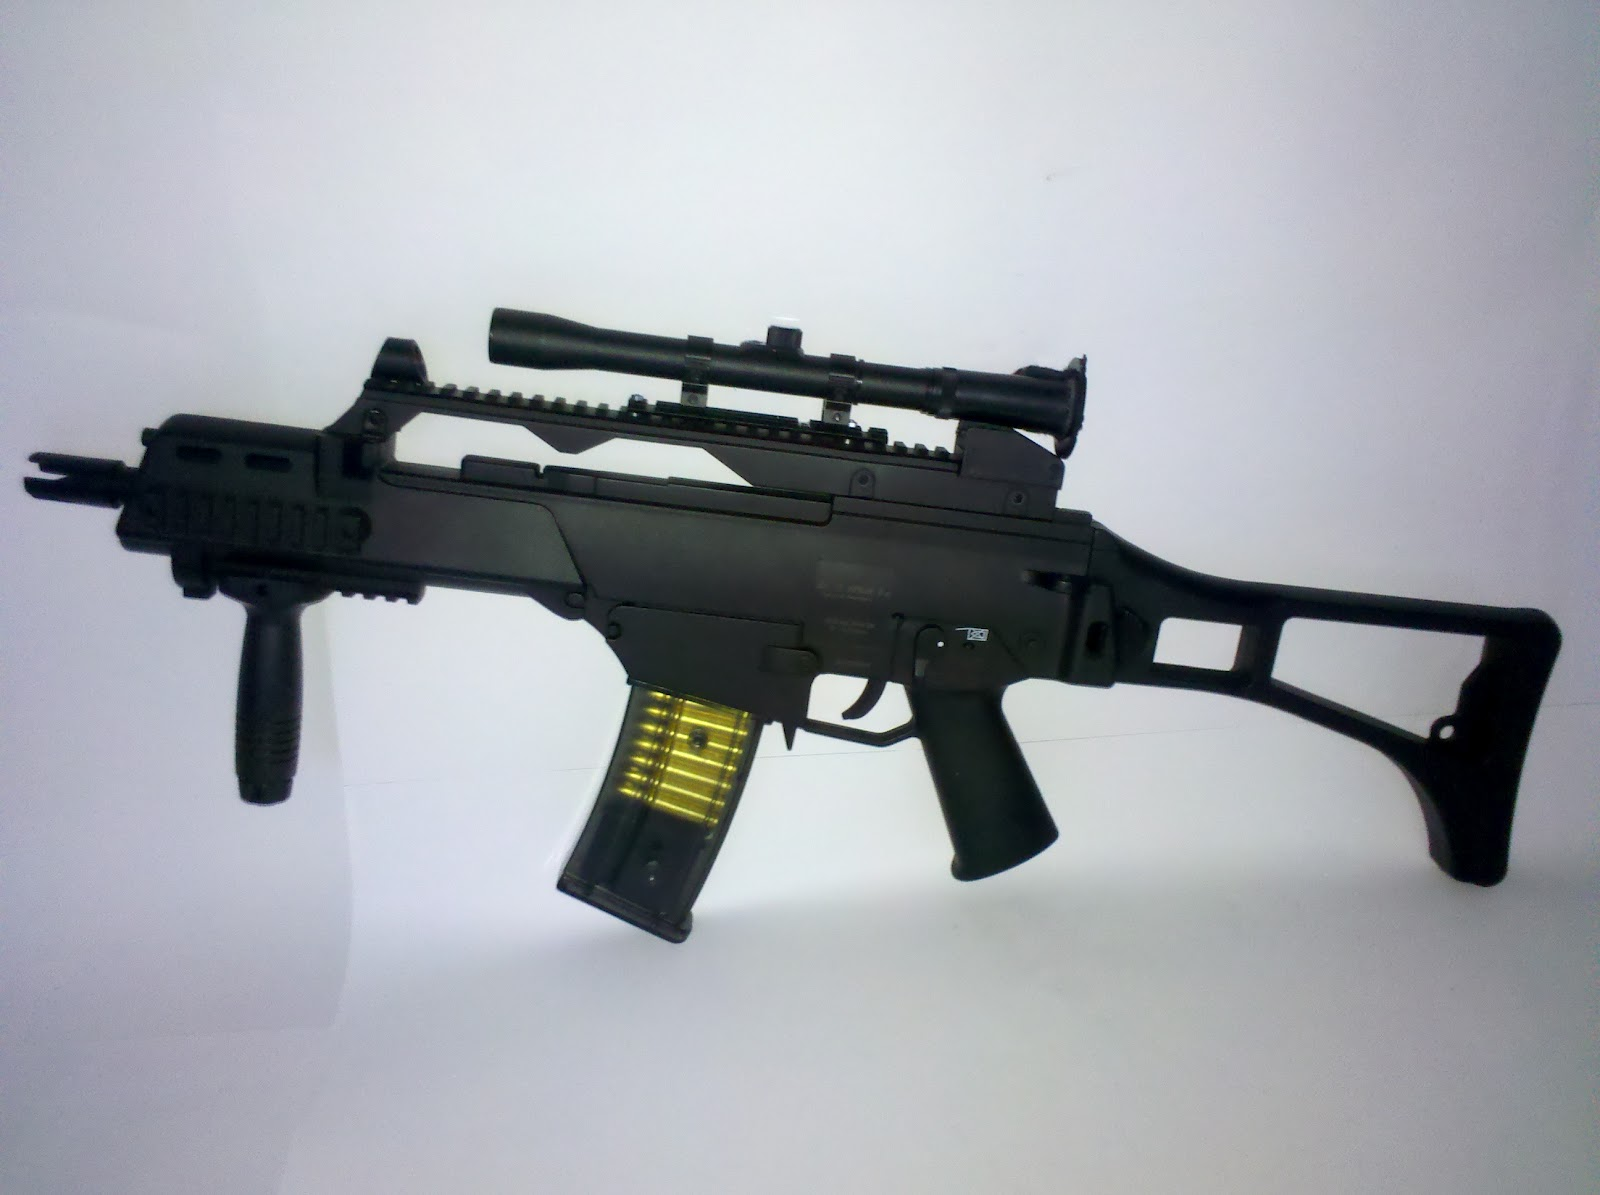 Do It Yourself Gadgets G36 Coilgun Model Movie Prop How To Build Magnetic Gun September 14 2012